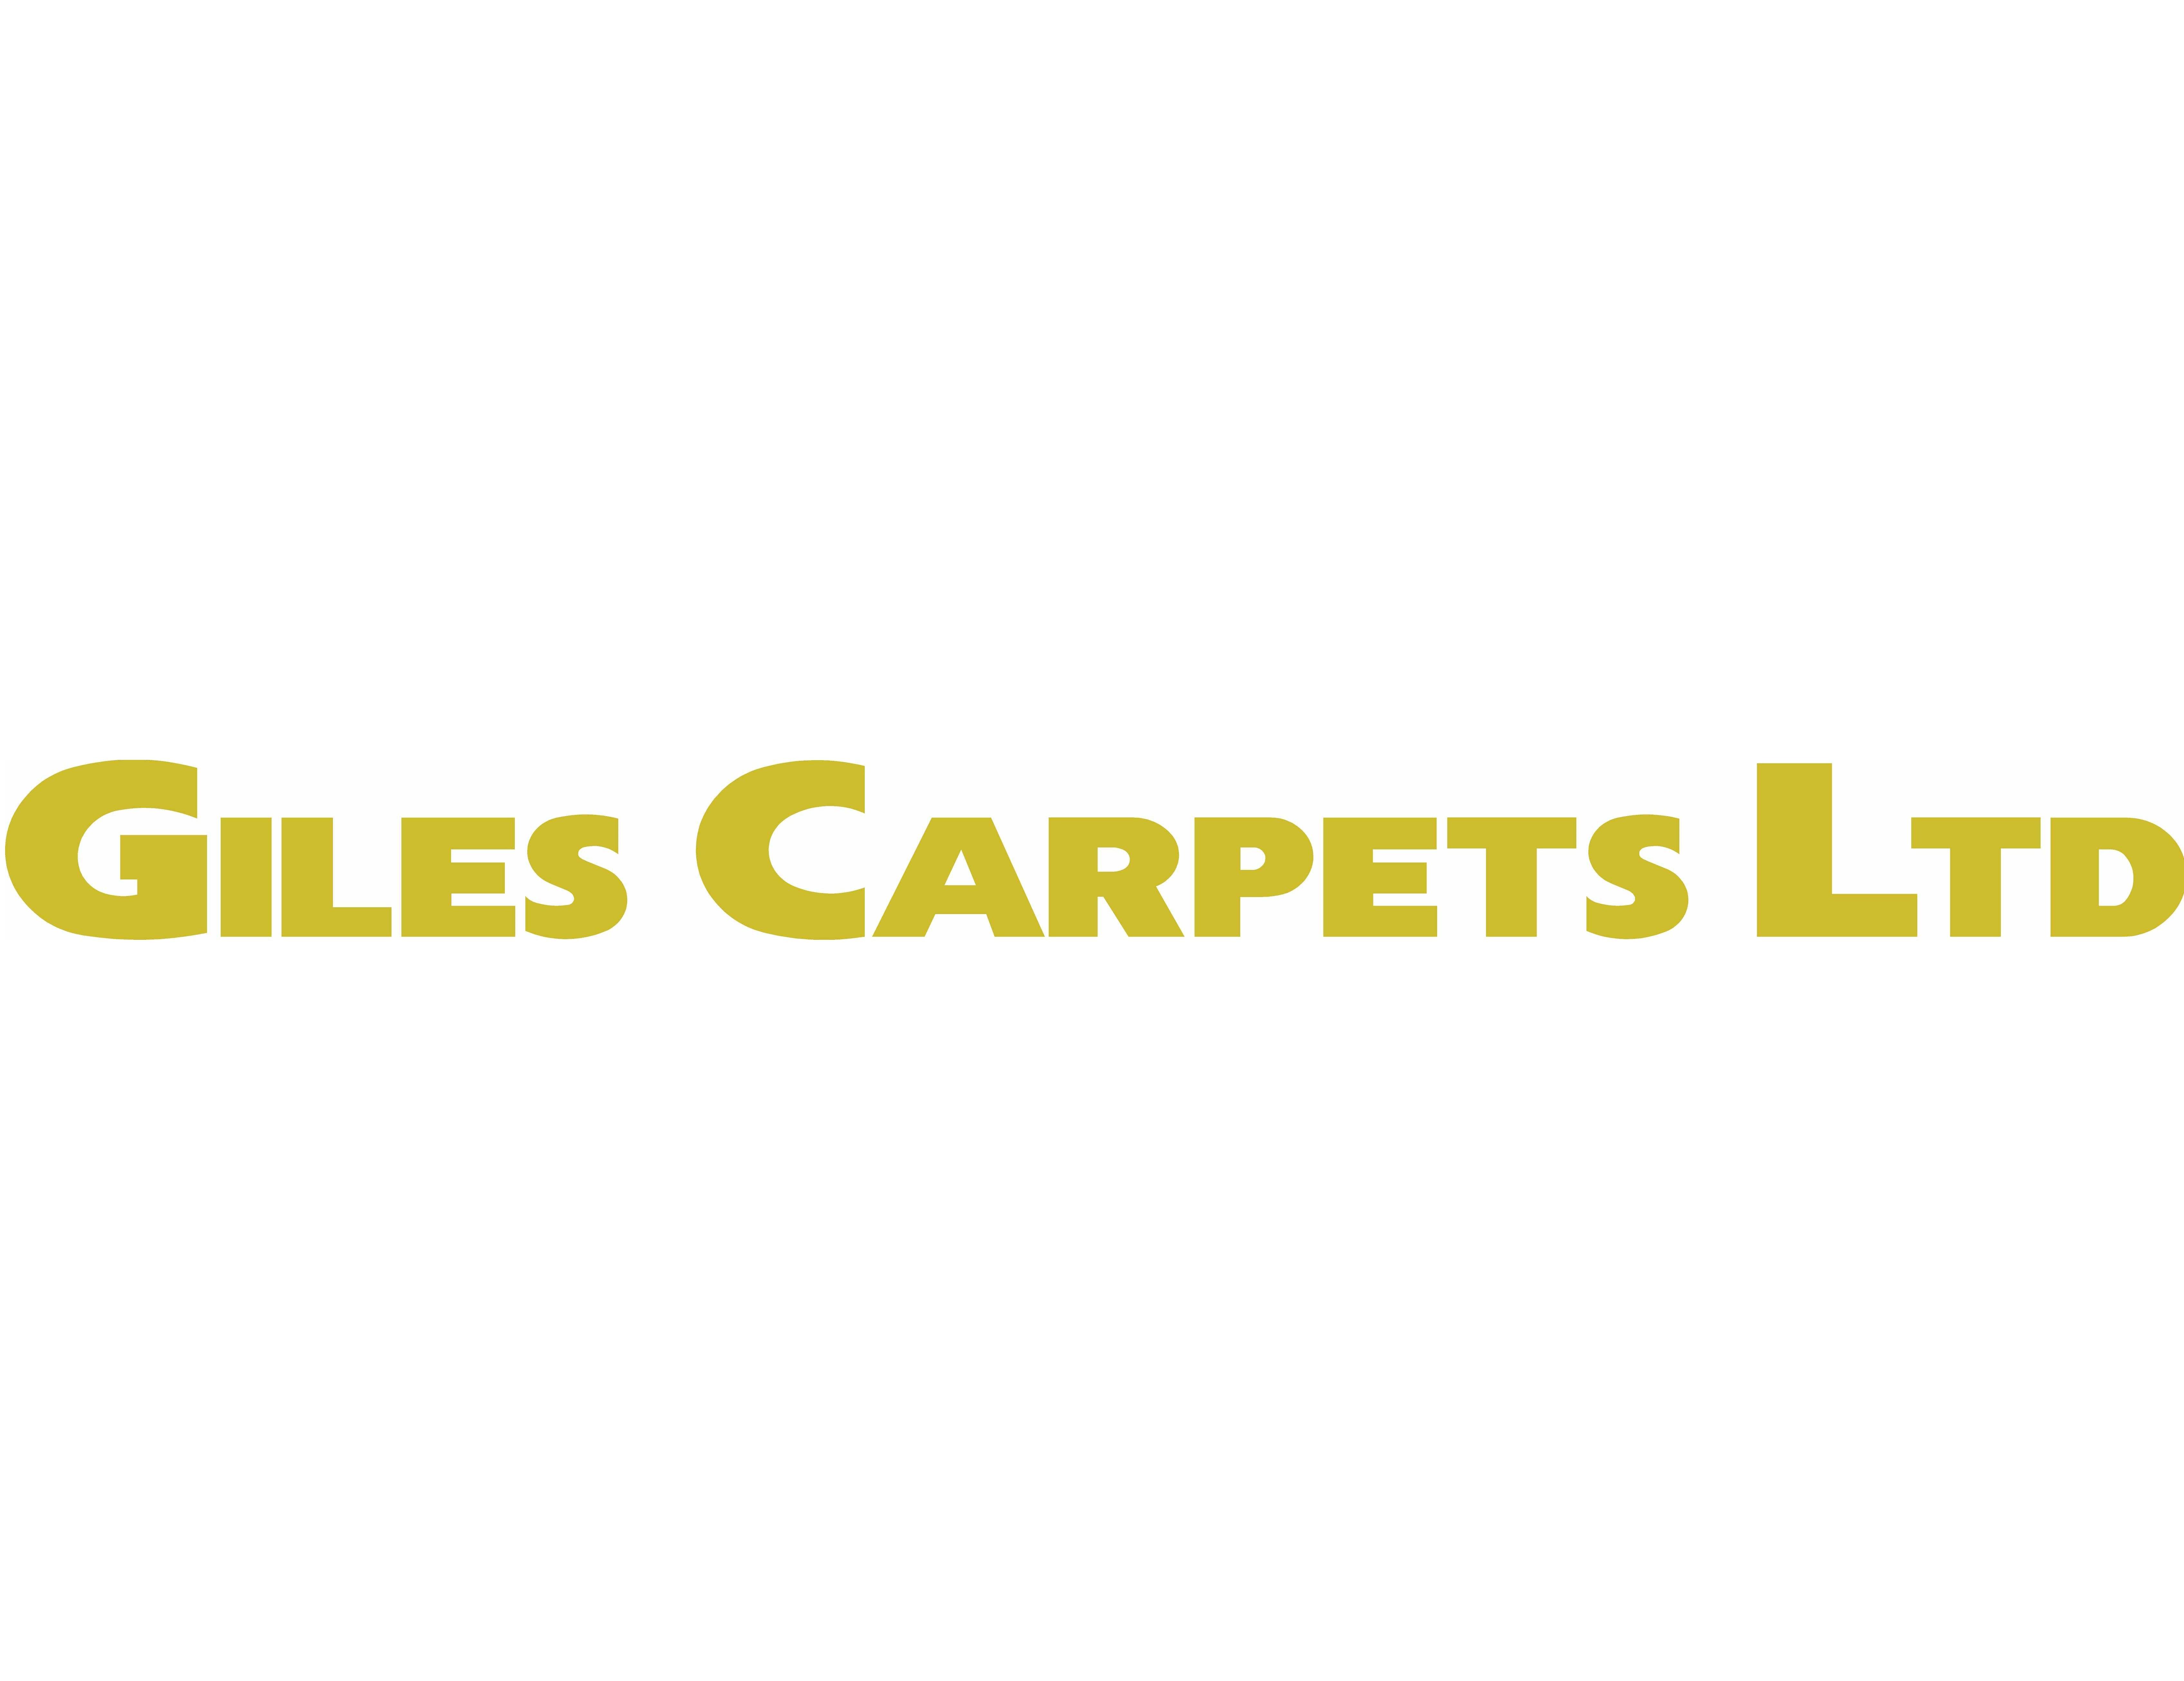 [Giles Carpets Ltd]